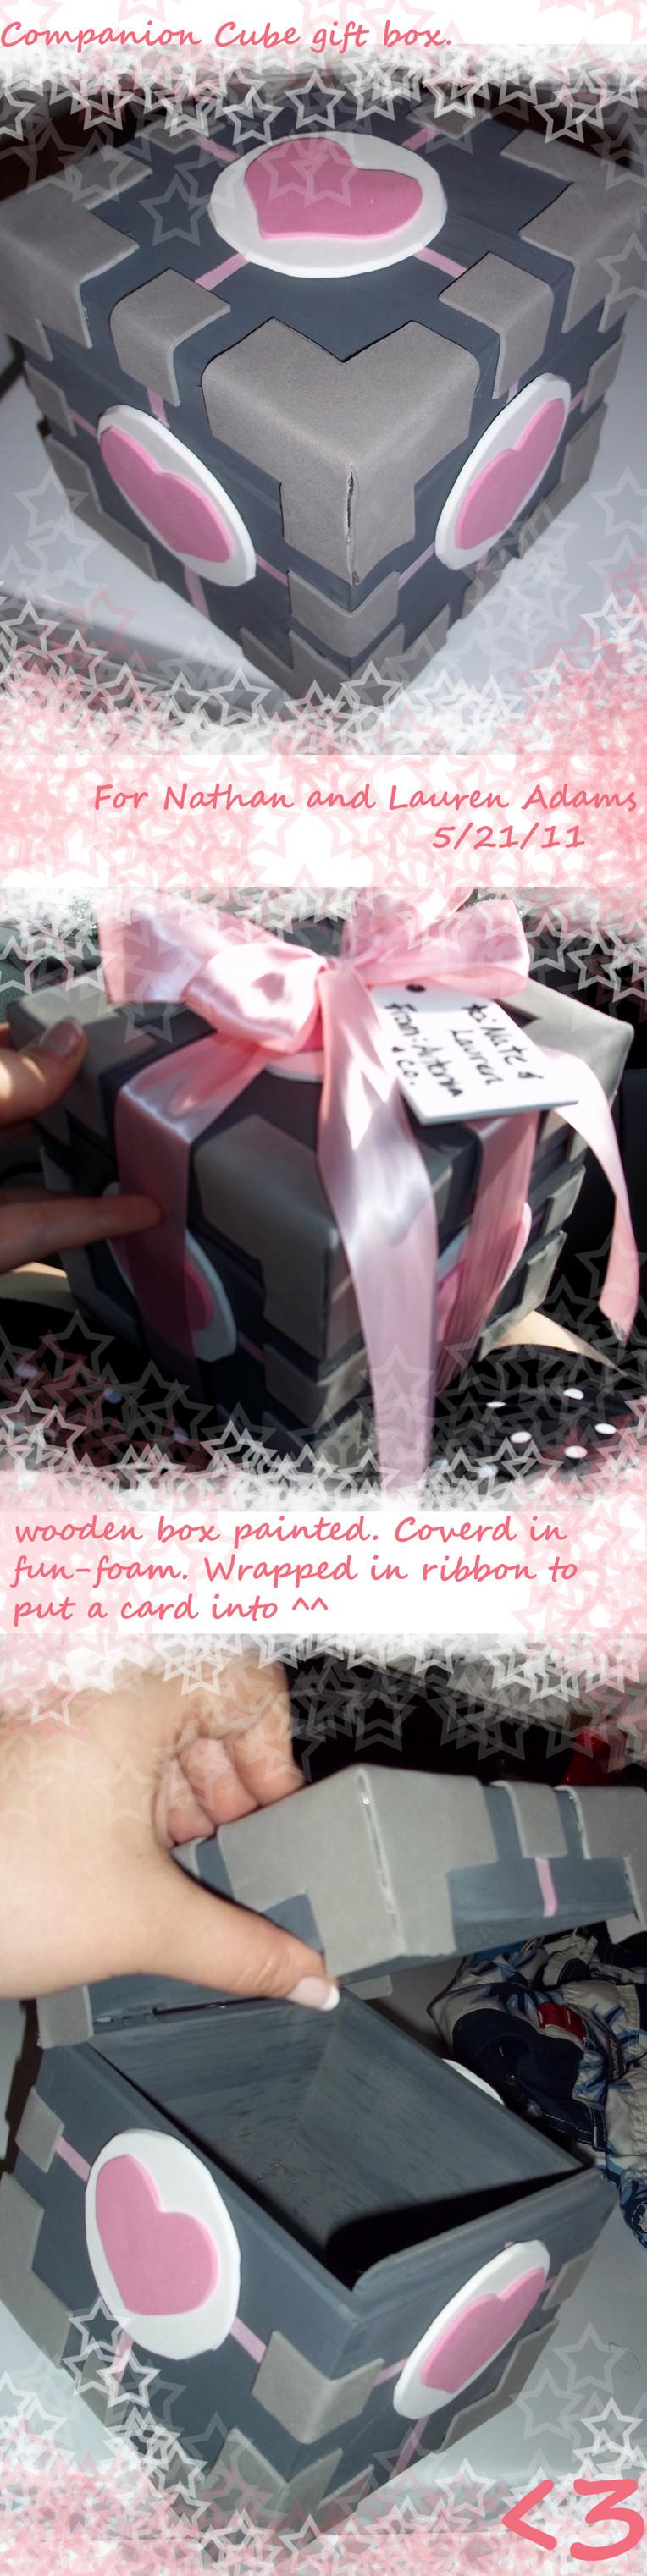 companion cube gift box. by AceroTiburon